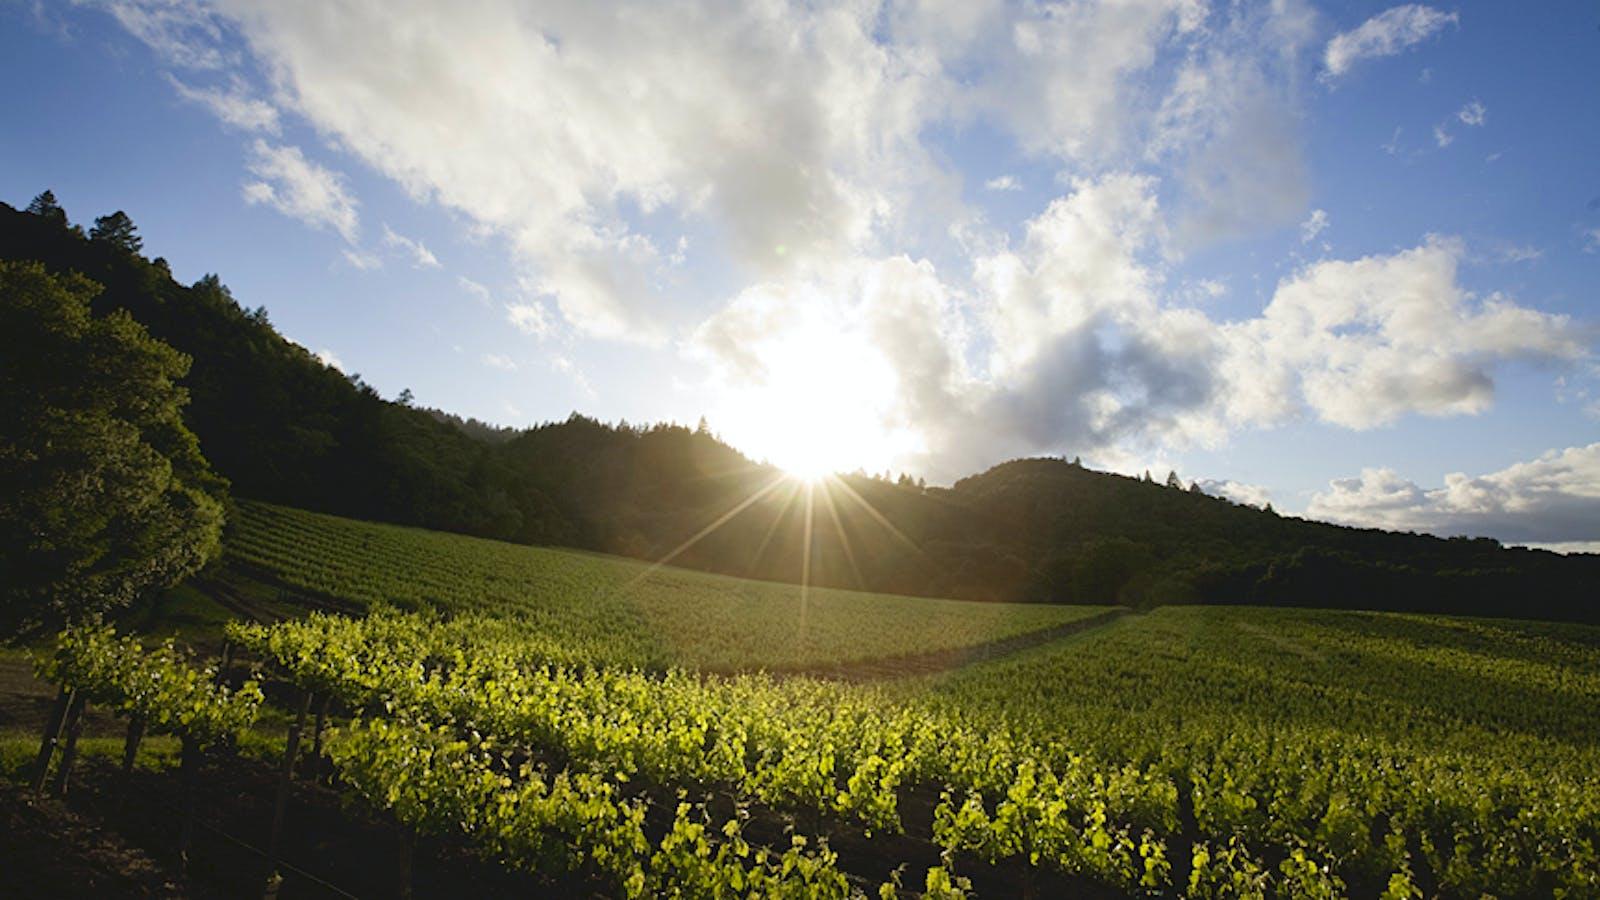 Vine Hill Ranch: One of Napa Cabernet's Best-Kept Secrets